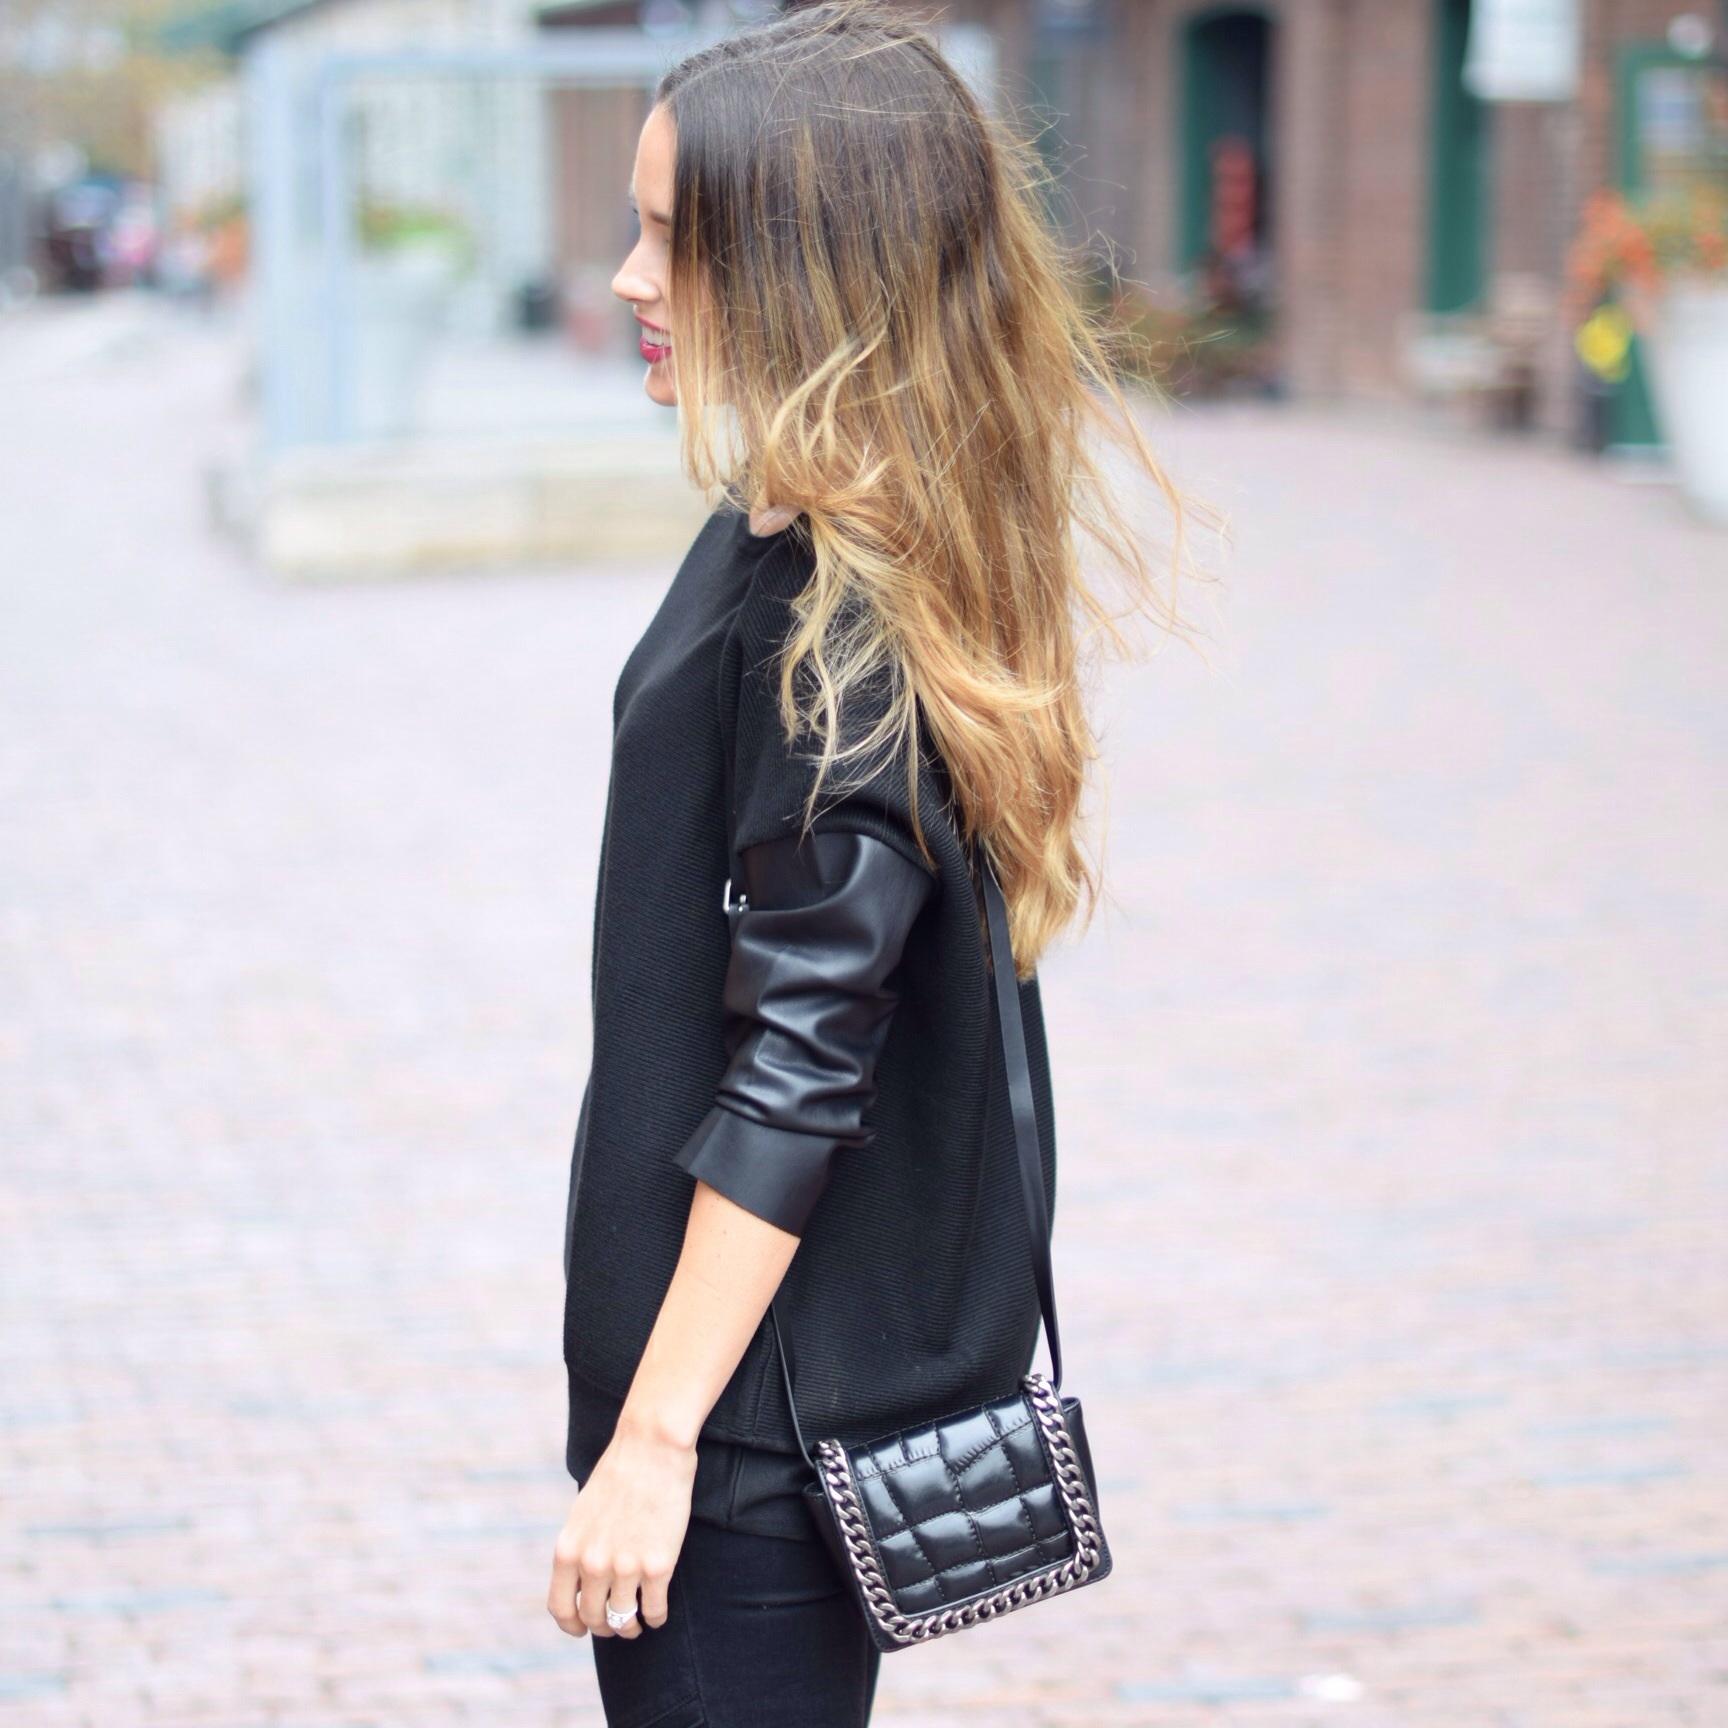 TorontoFashionBlogger